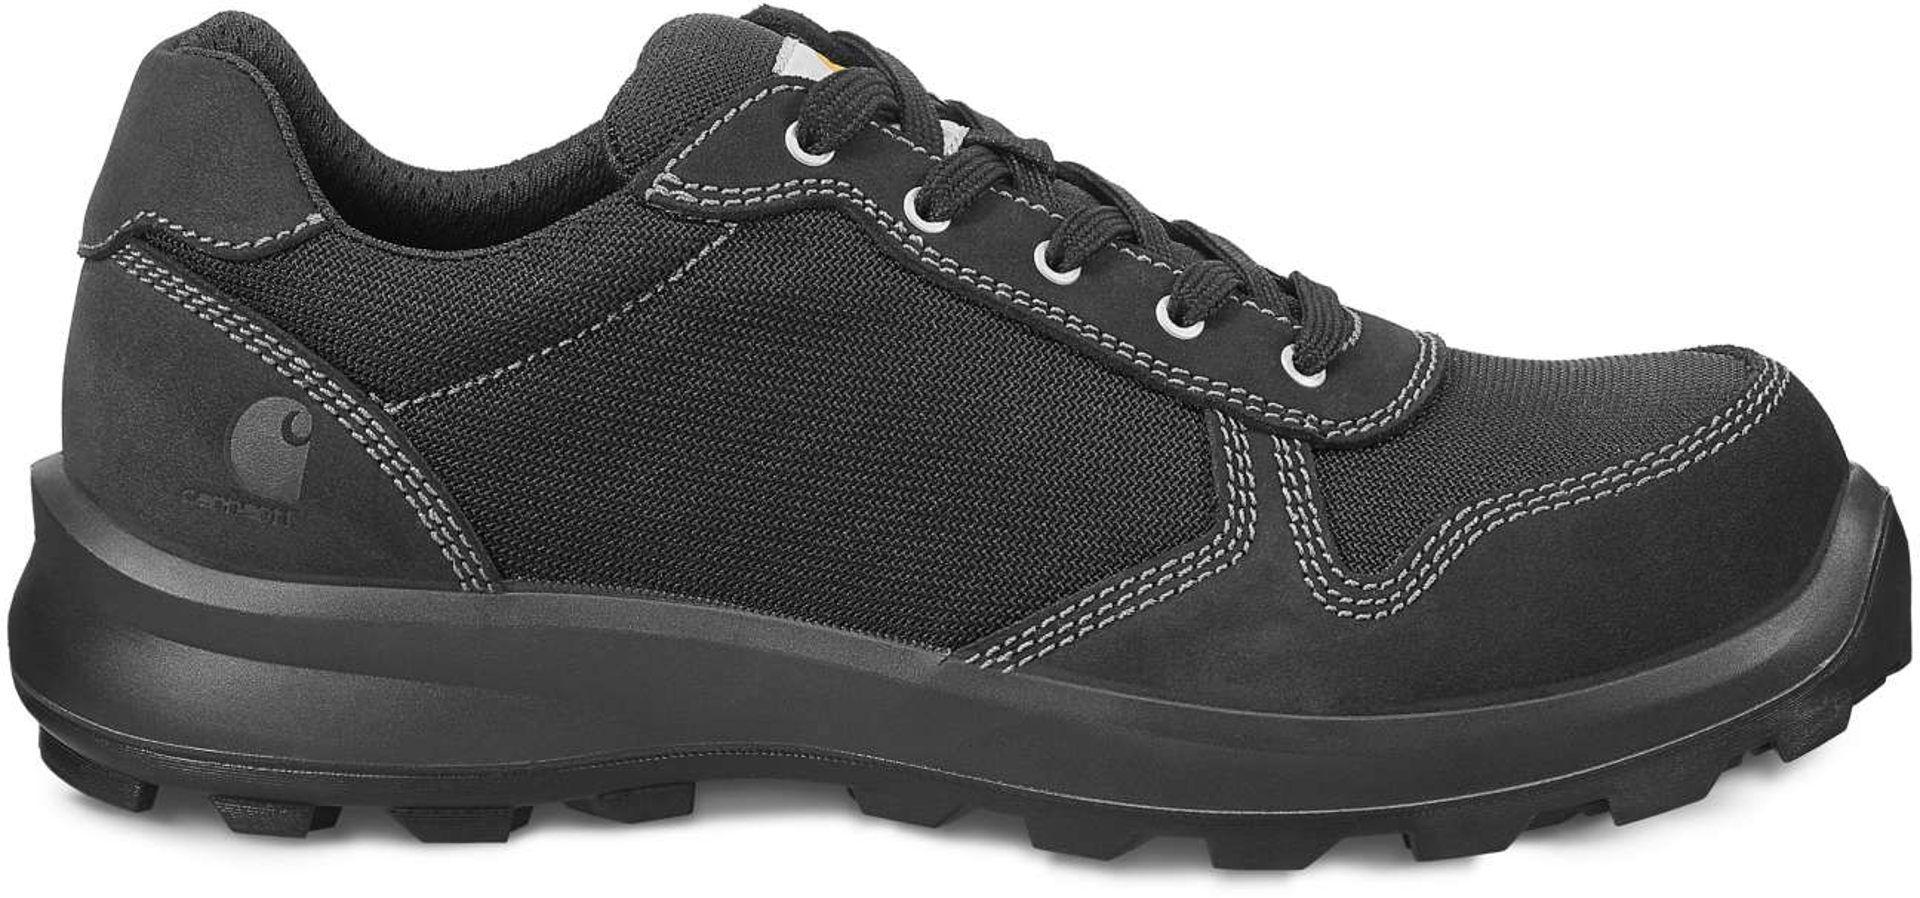 Carhartt Michigan Shoes Black 45